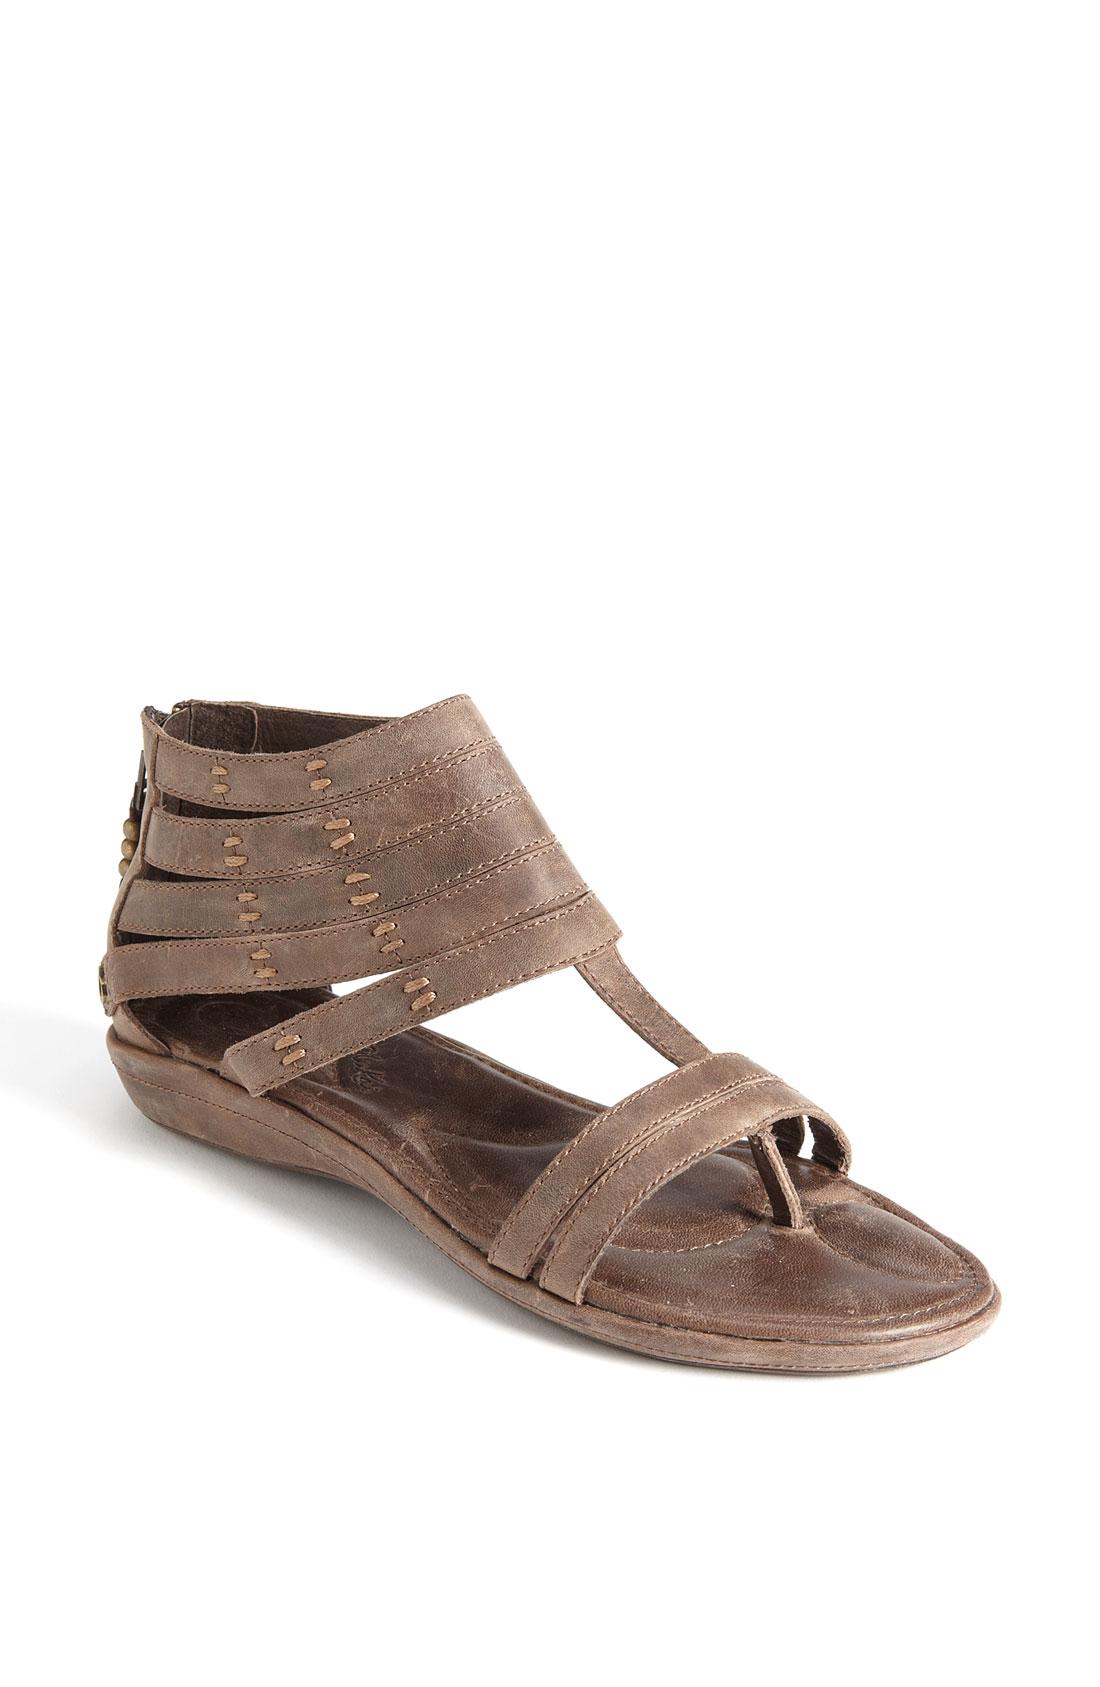 Olukai Olukai Kalai Sandal In Brown Java Java Lyst